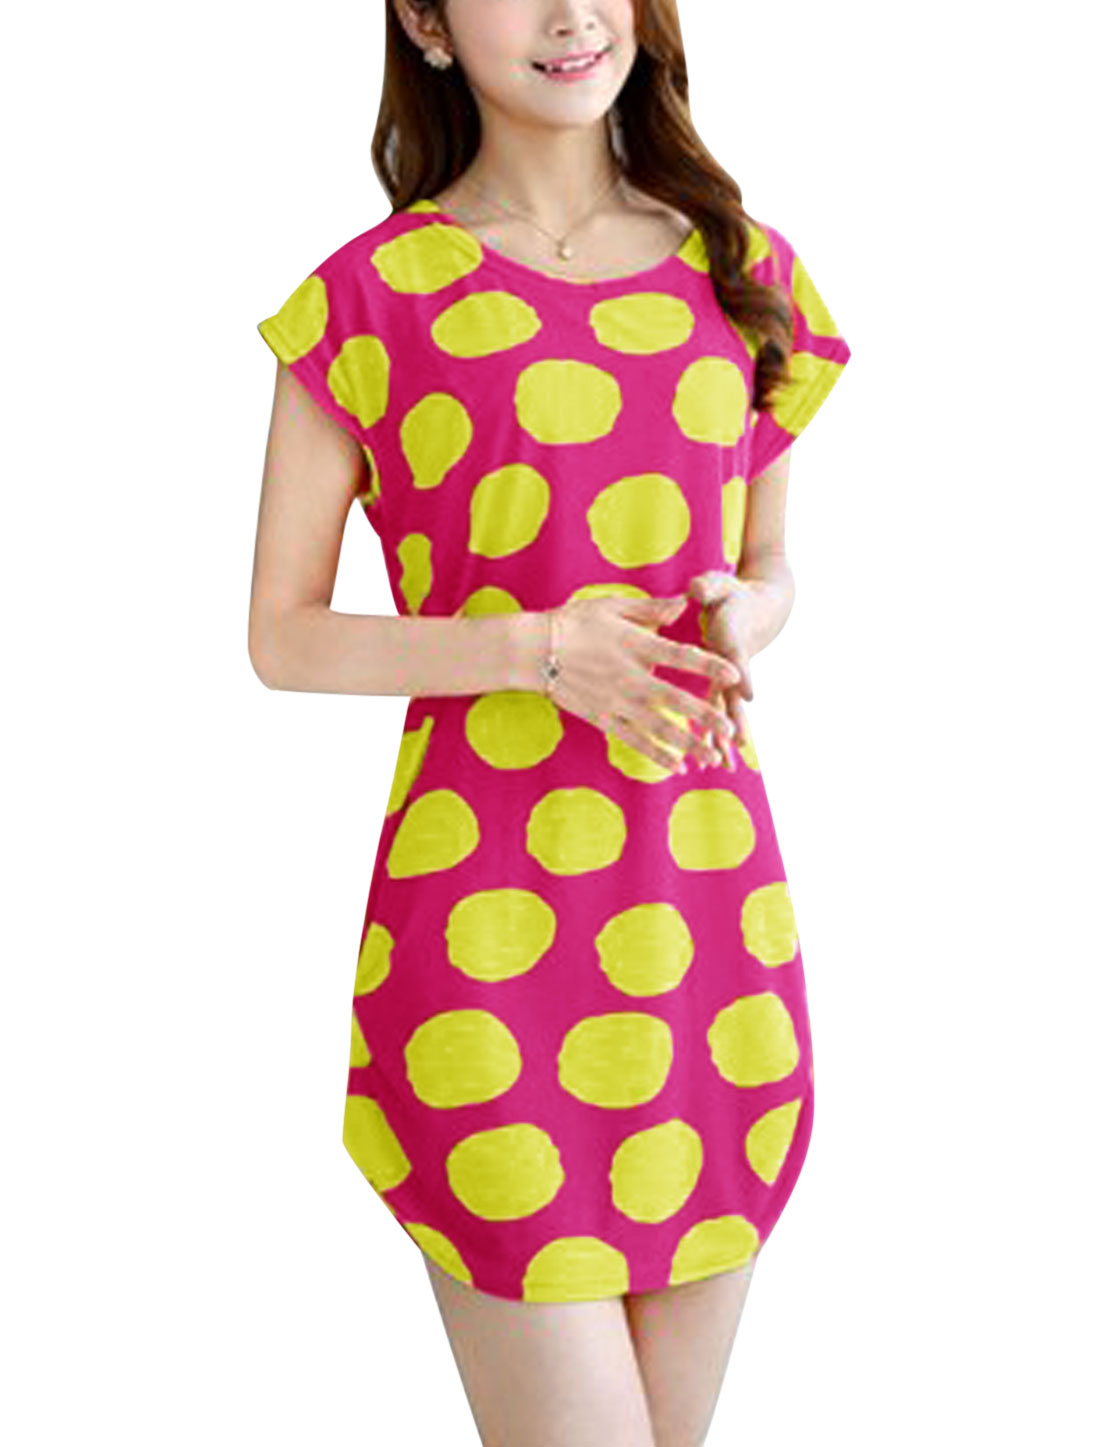 Ladies Polka Dots Prints Round Neck Shirred Sides Tunic Dress Fuchsia S